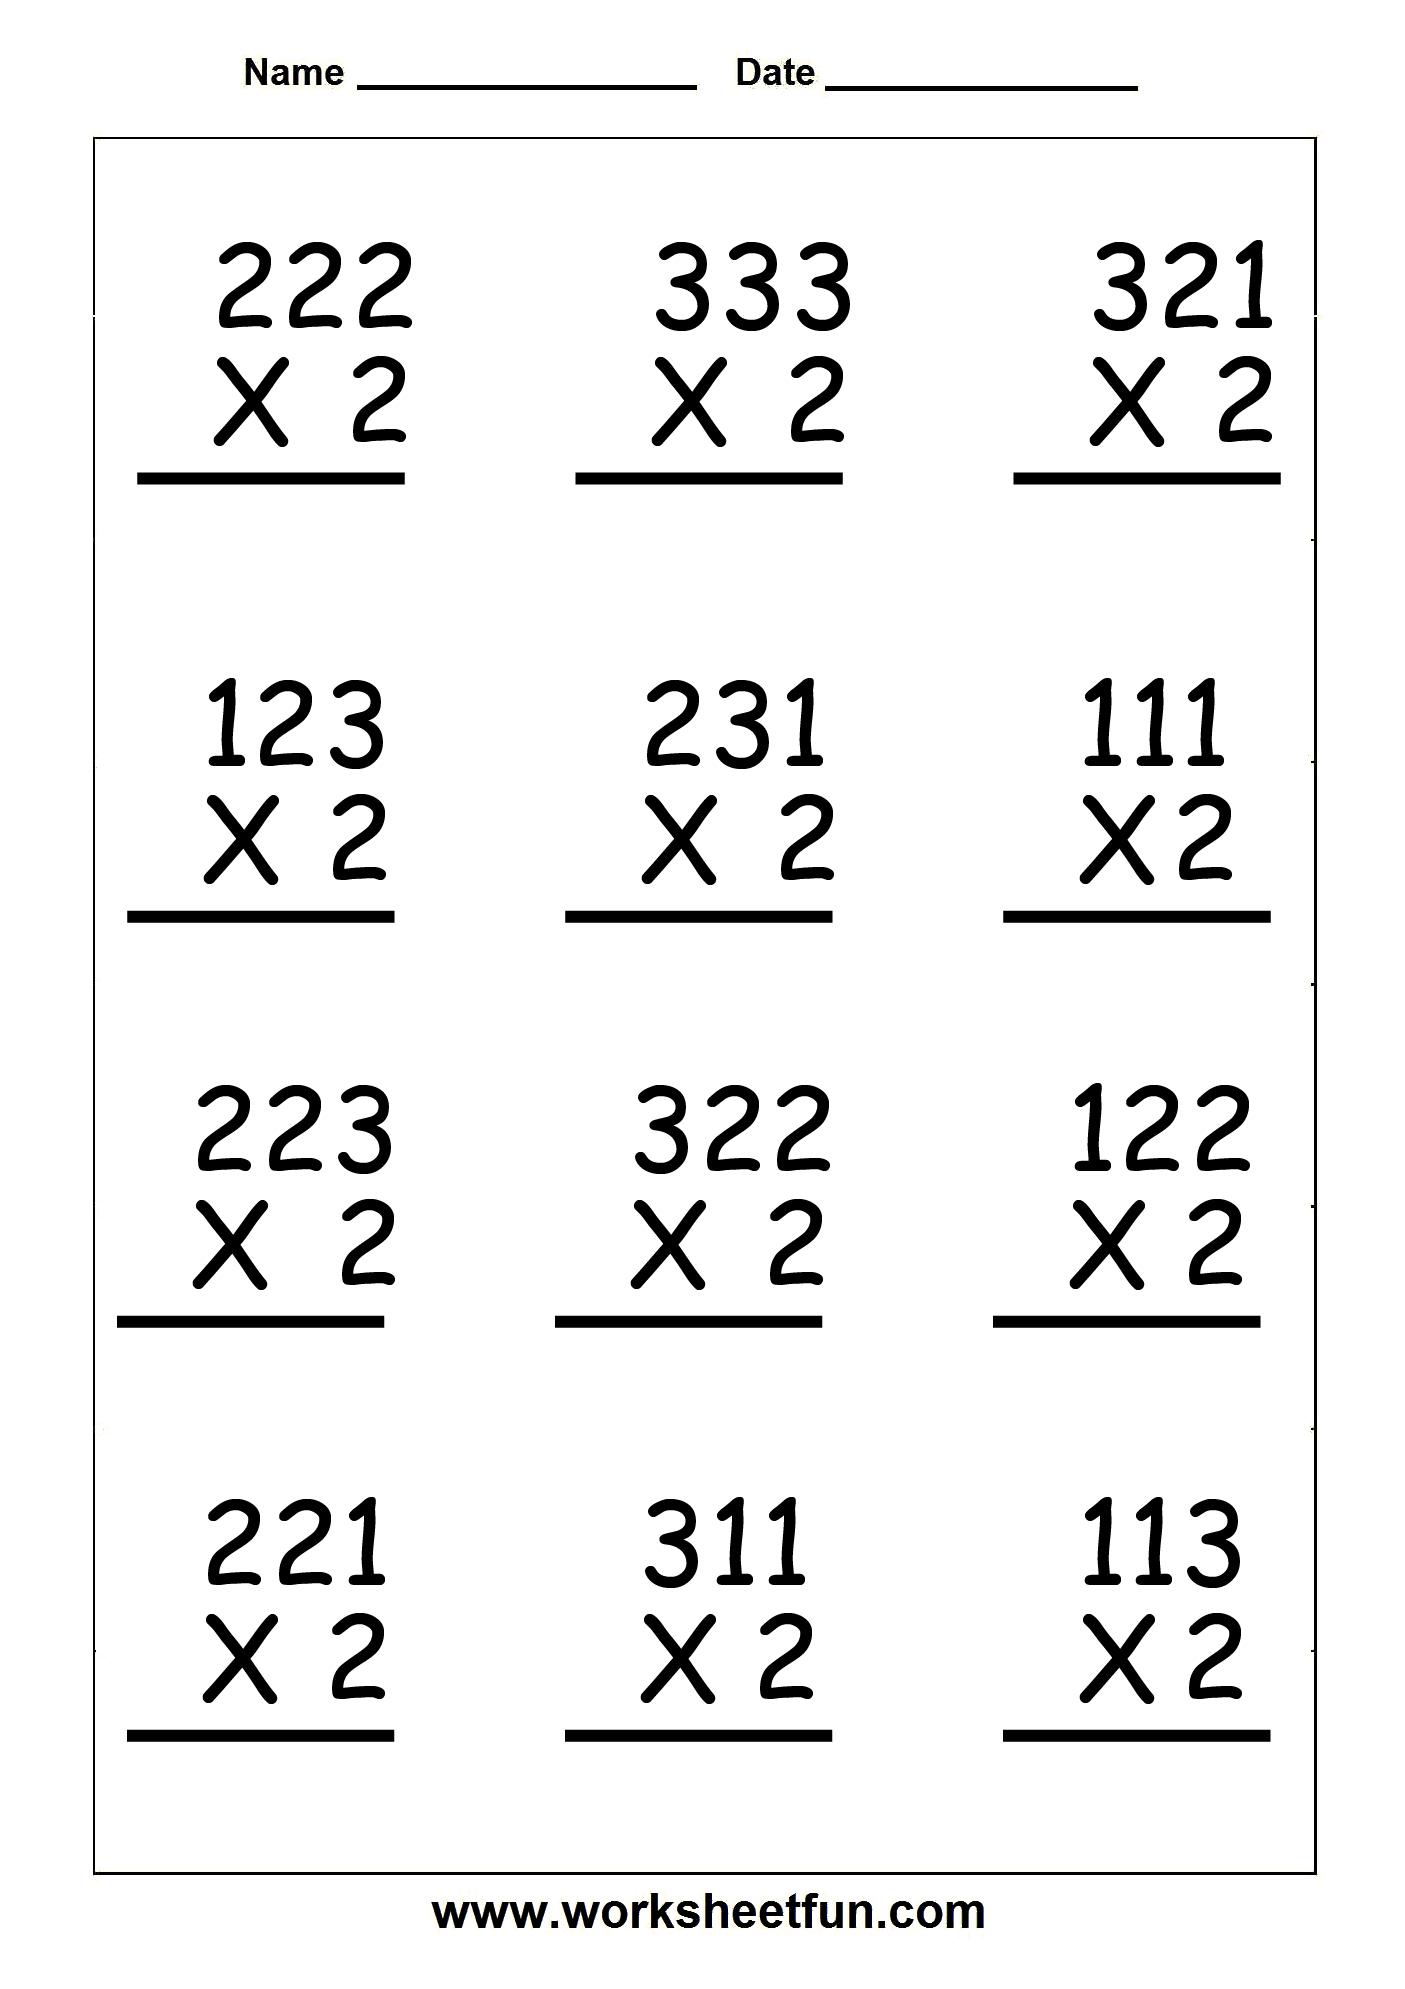 Copy Of Single Digit Multiplication Worksheets - Lessons - Tes Teach   3 Digit Multiplication Worksheets Printable